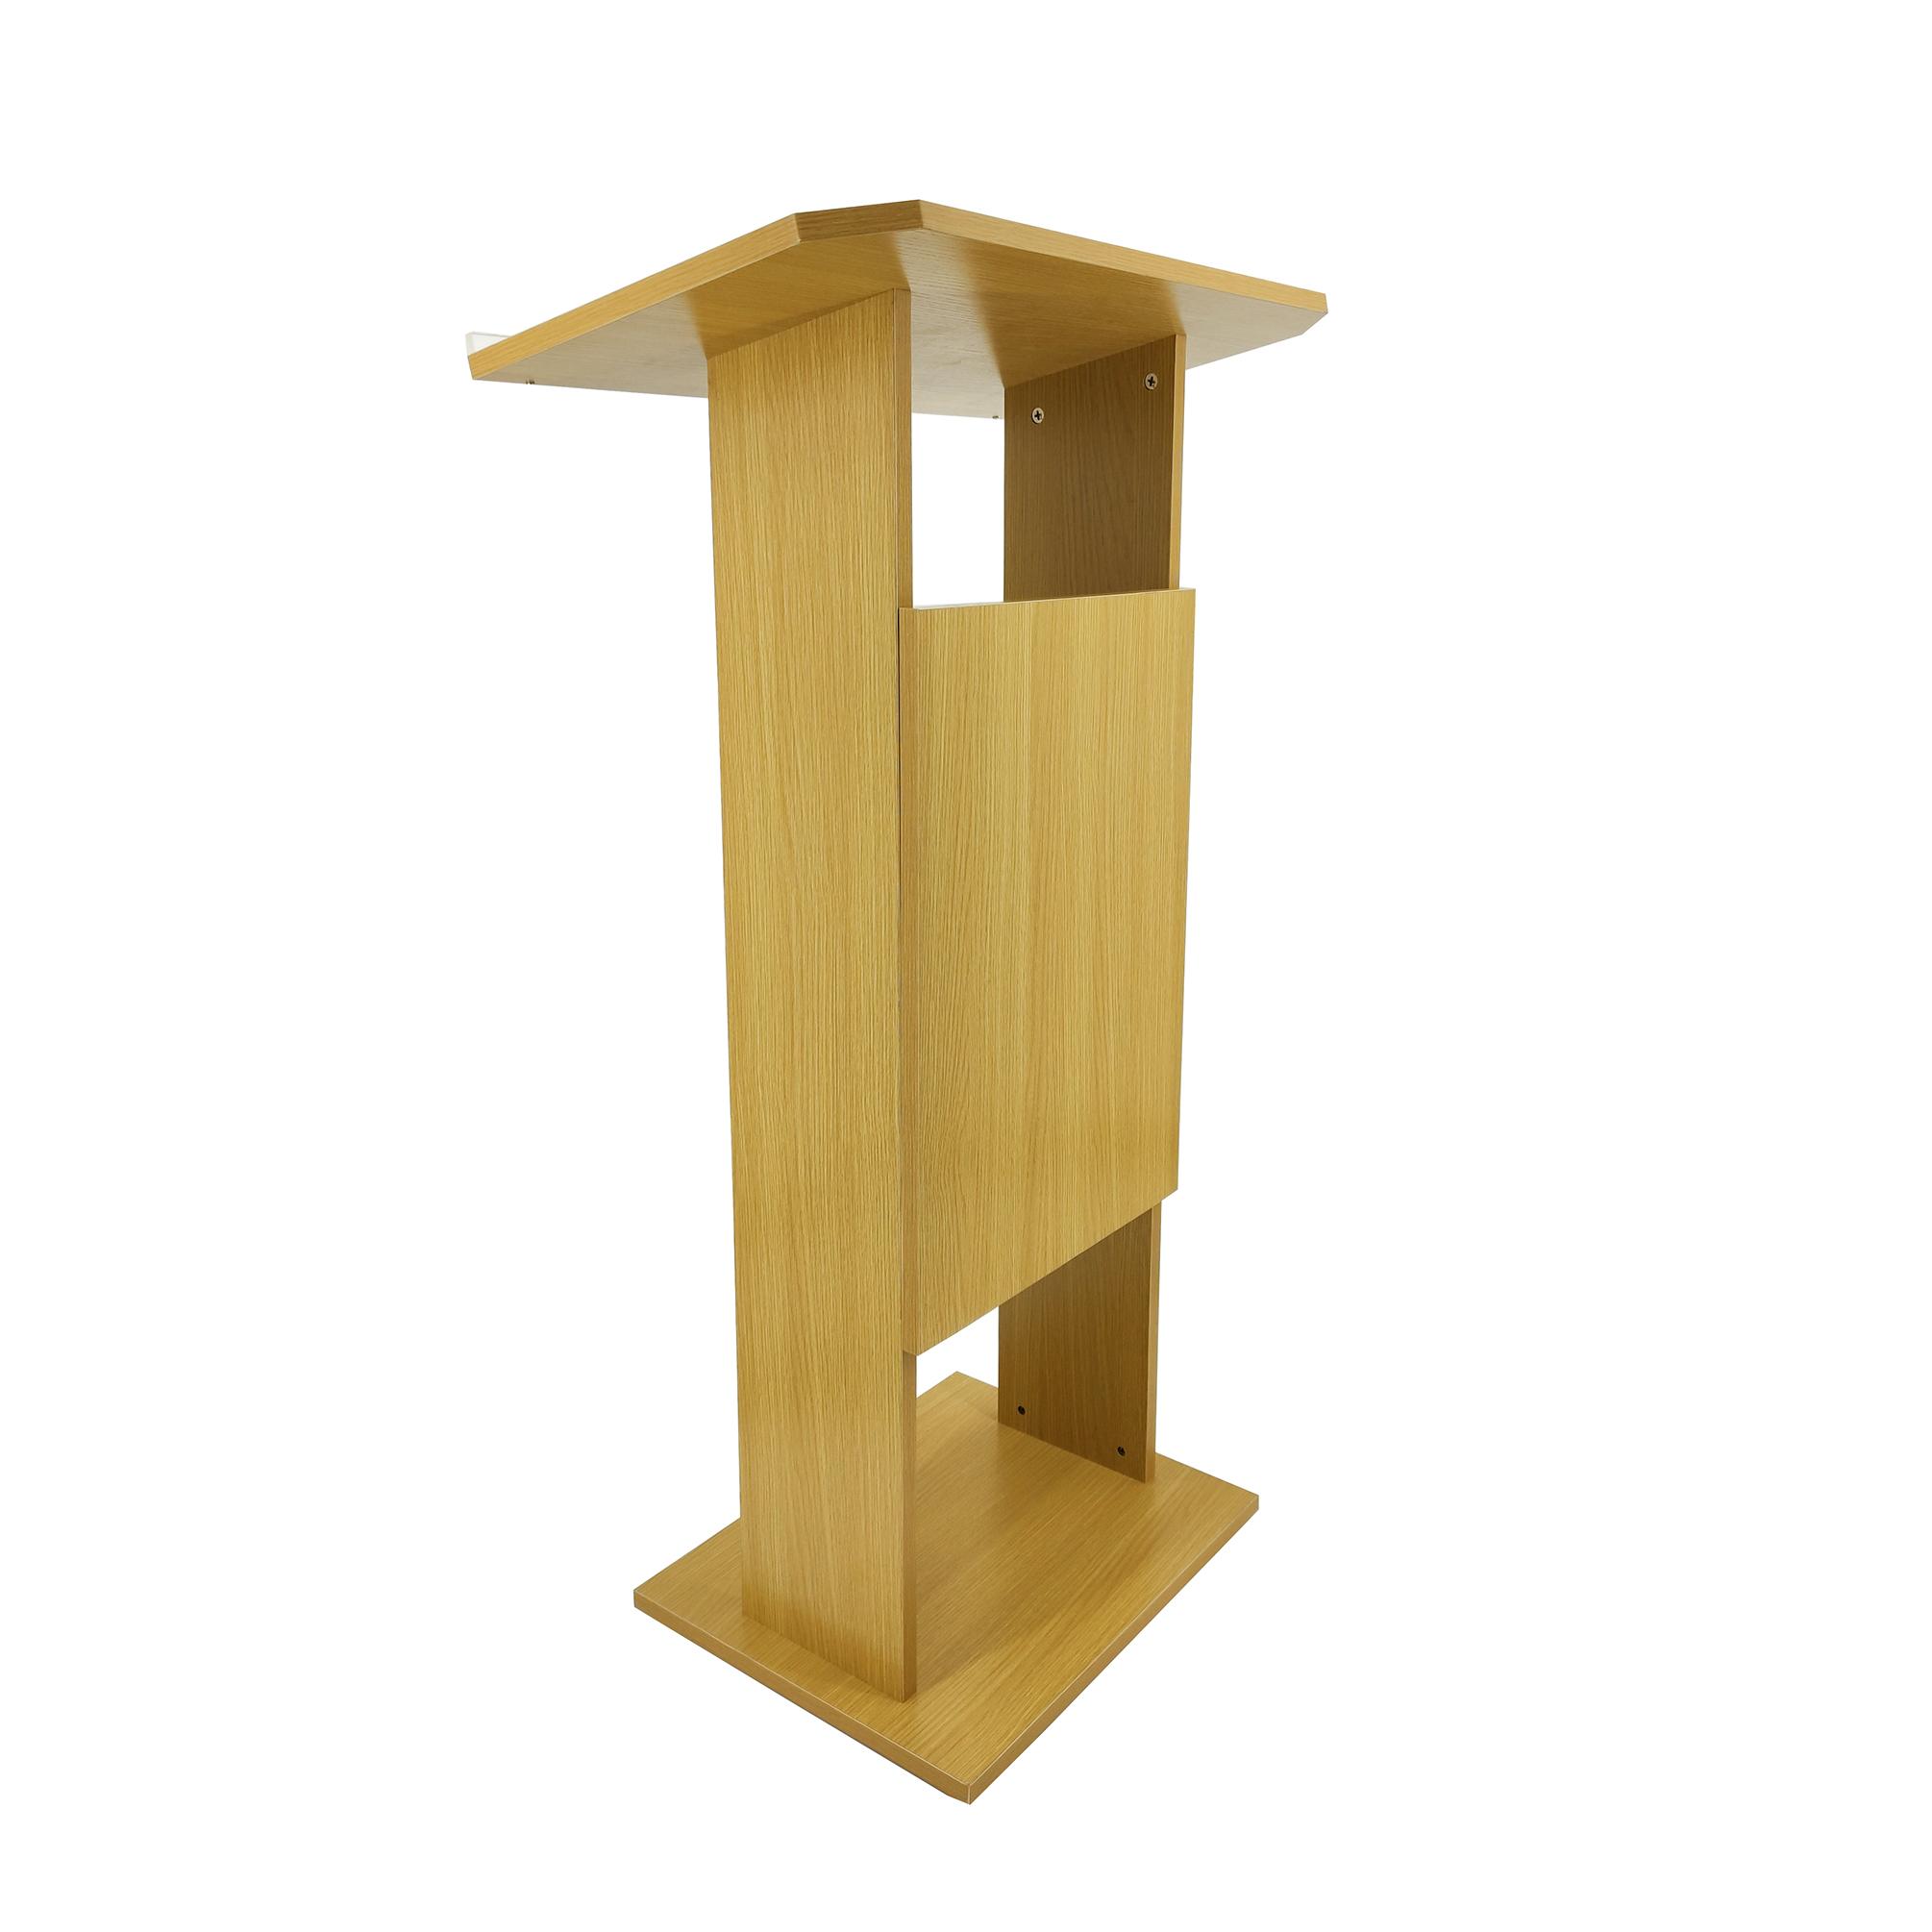 Wood Mdf Podium Church Pulpit Conference Podium Pulpit